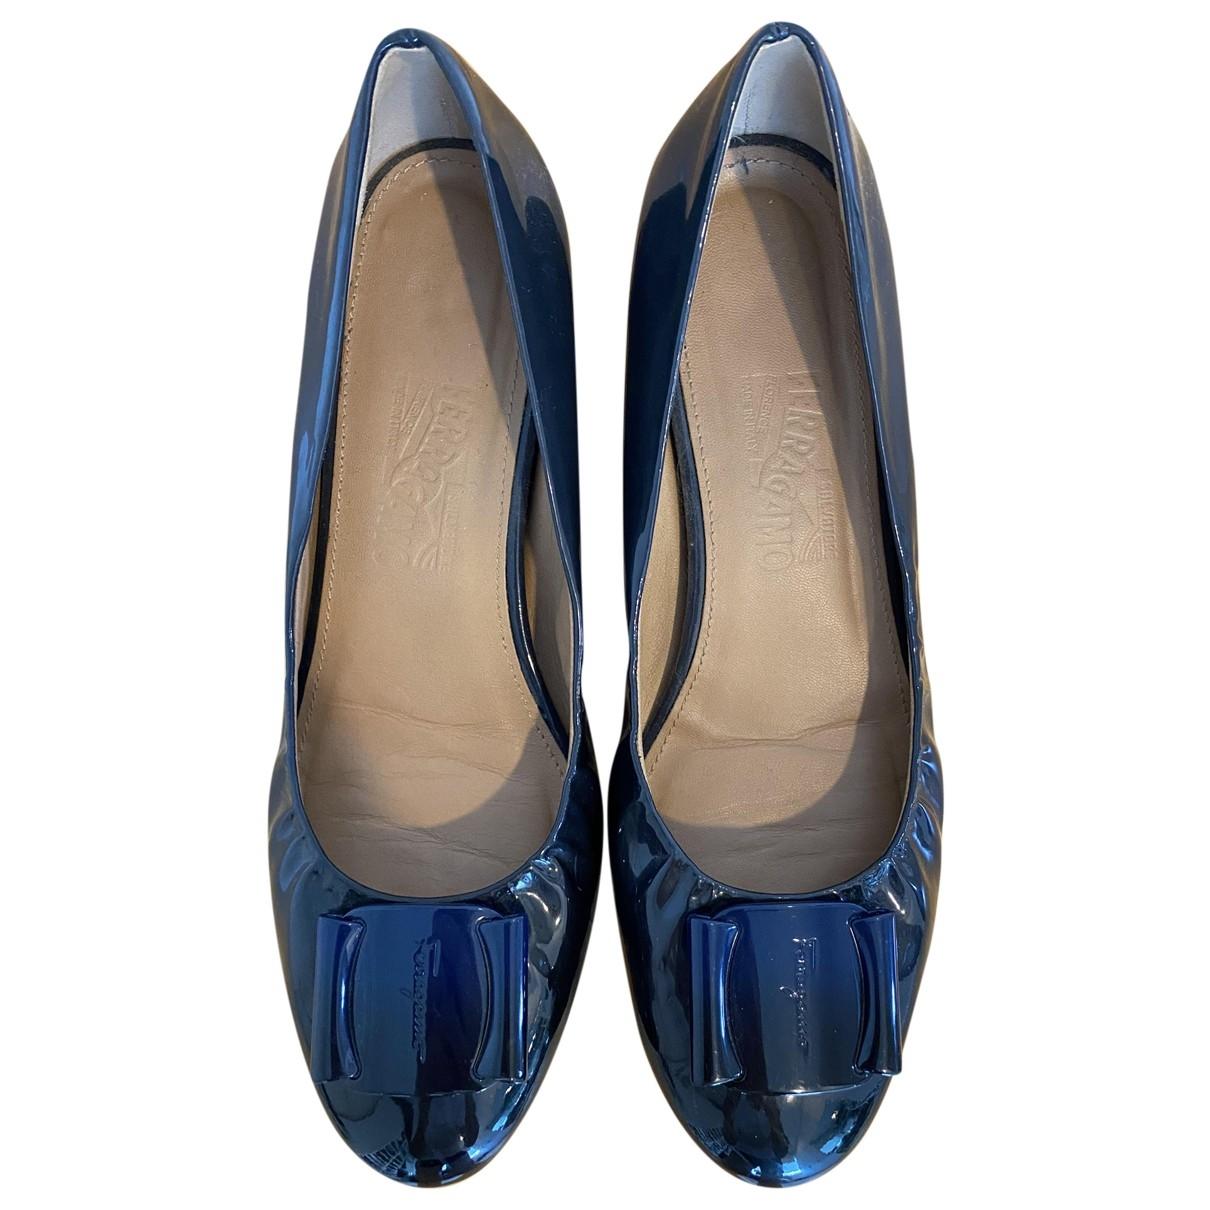 Salvatore Ferragamo \N Blue Patent leather Ballet flats for Women 40 UK